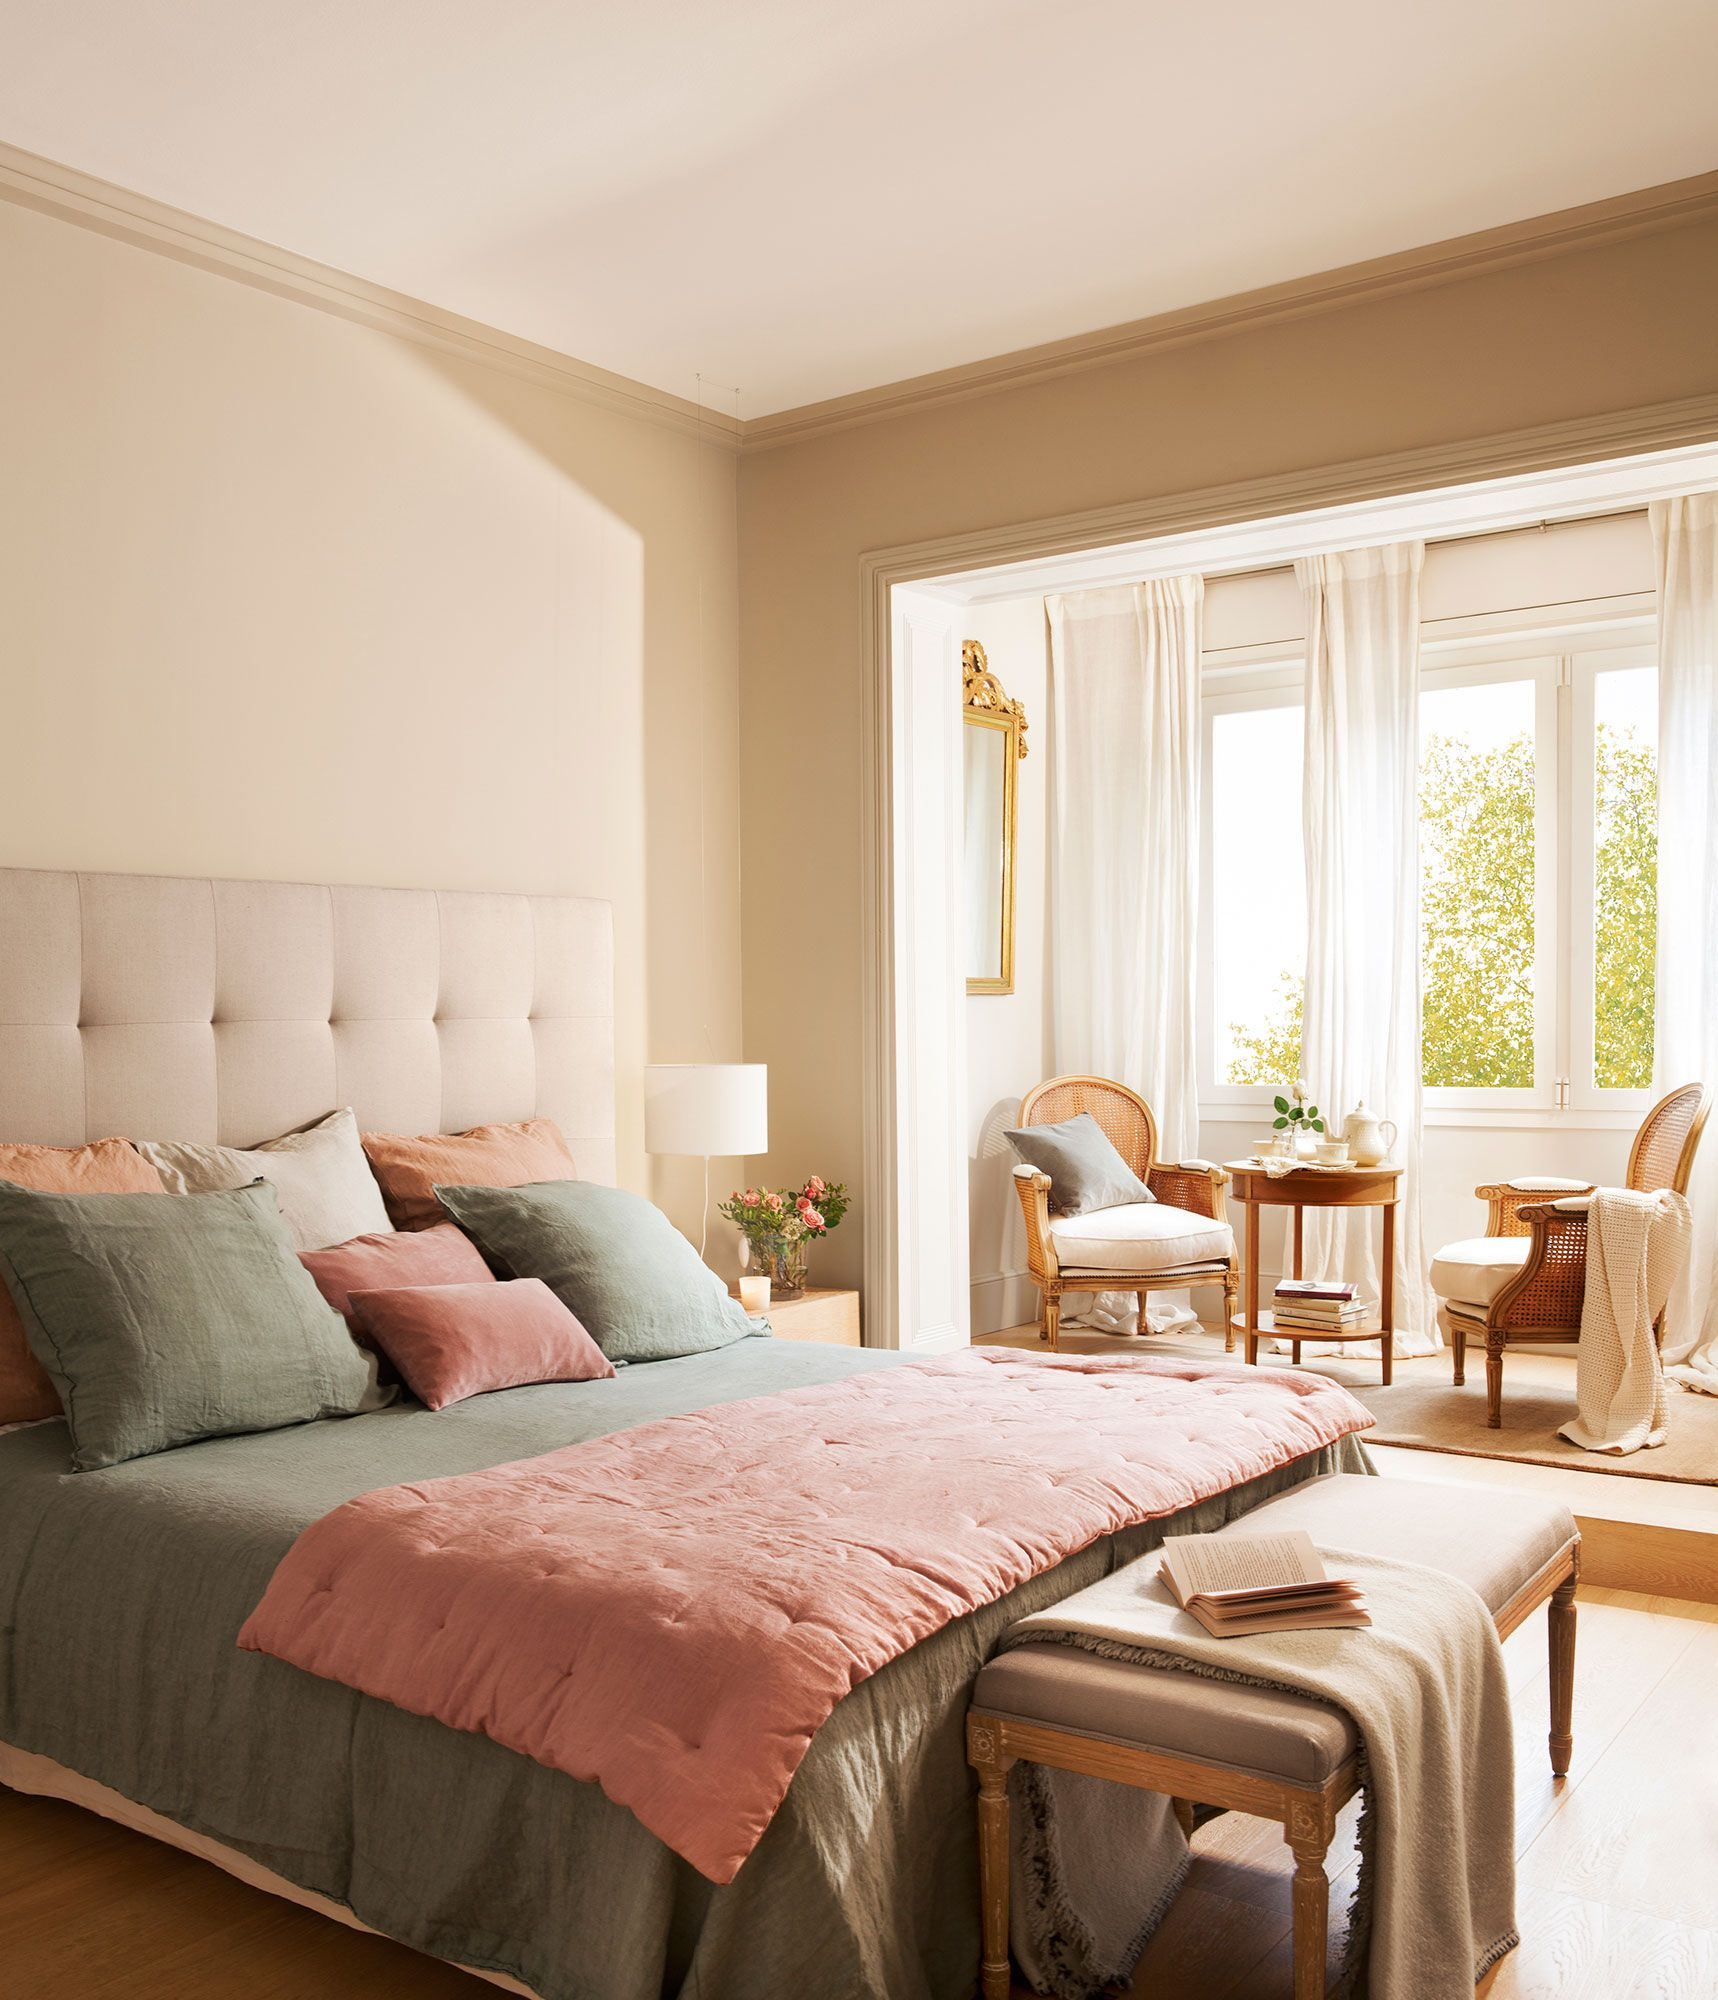 20 dormitorios con muchas ideas pinteres for Camas de matrimonio super grandes